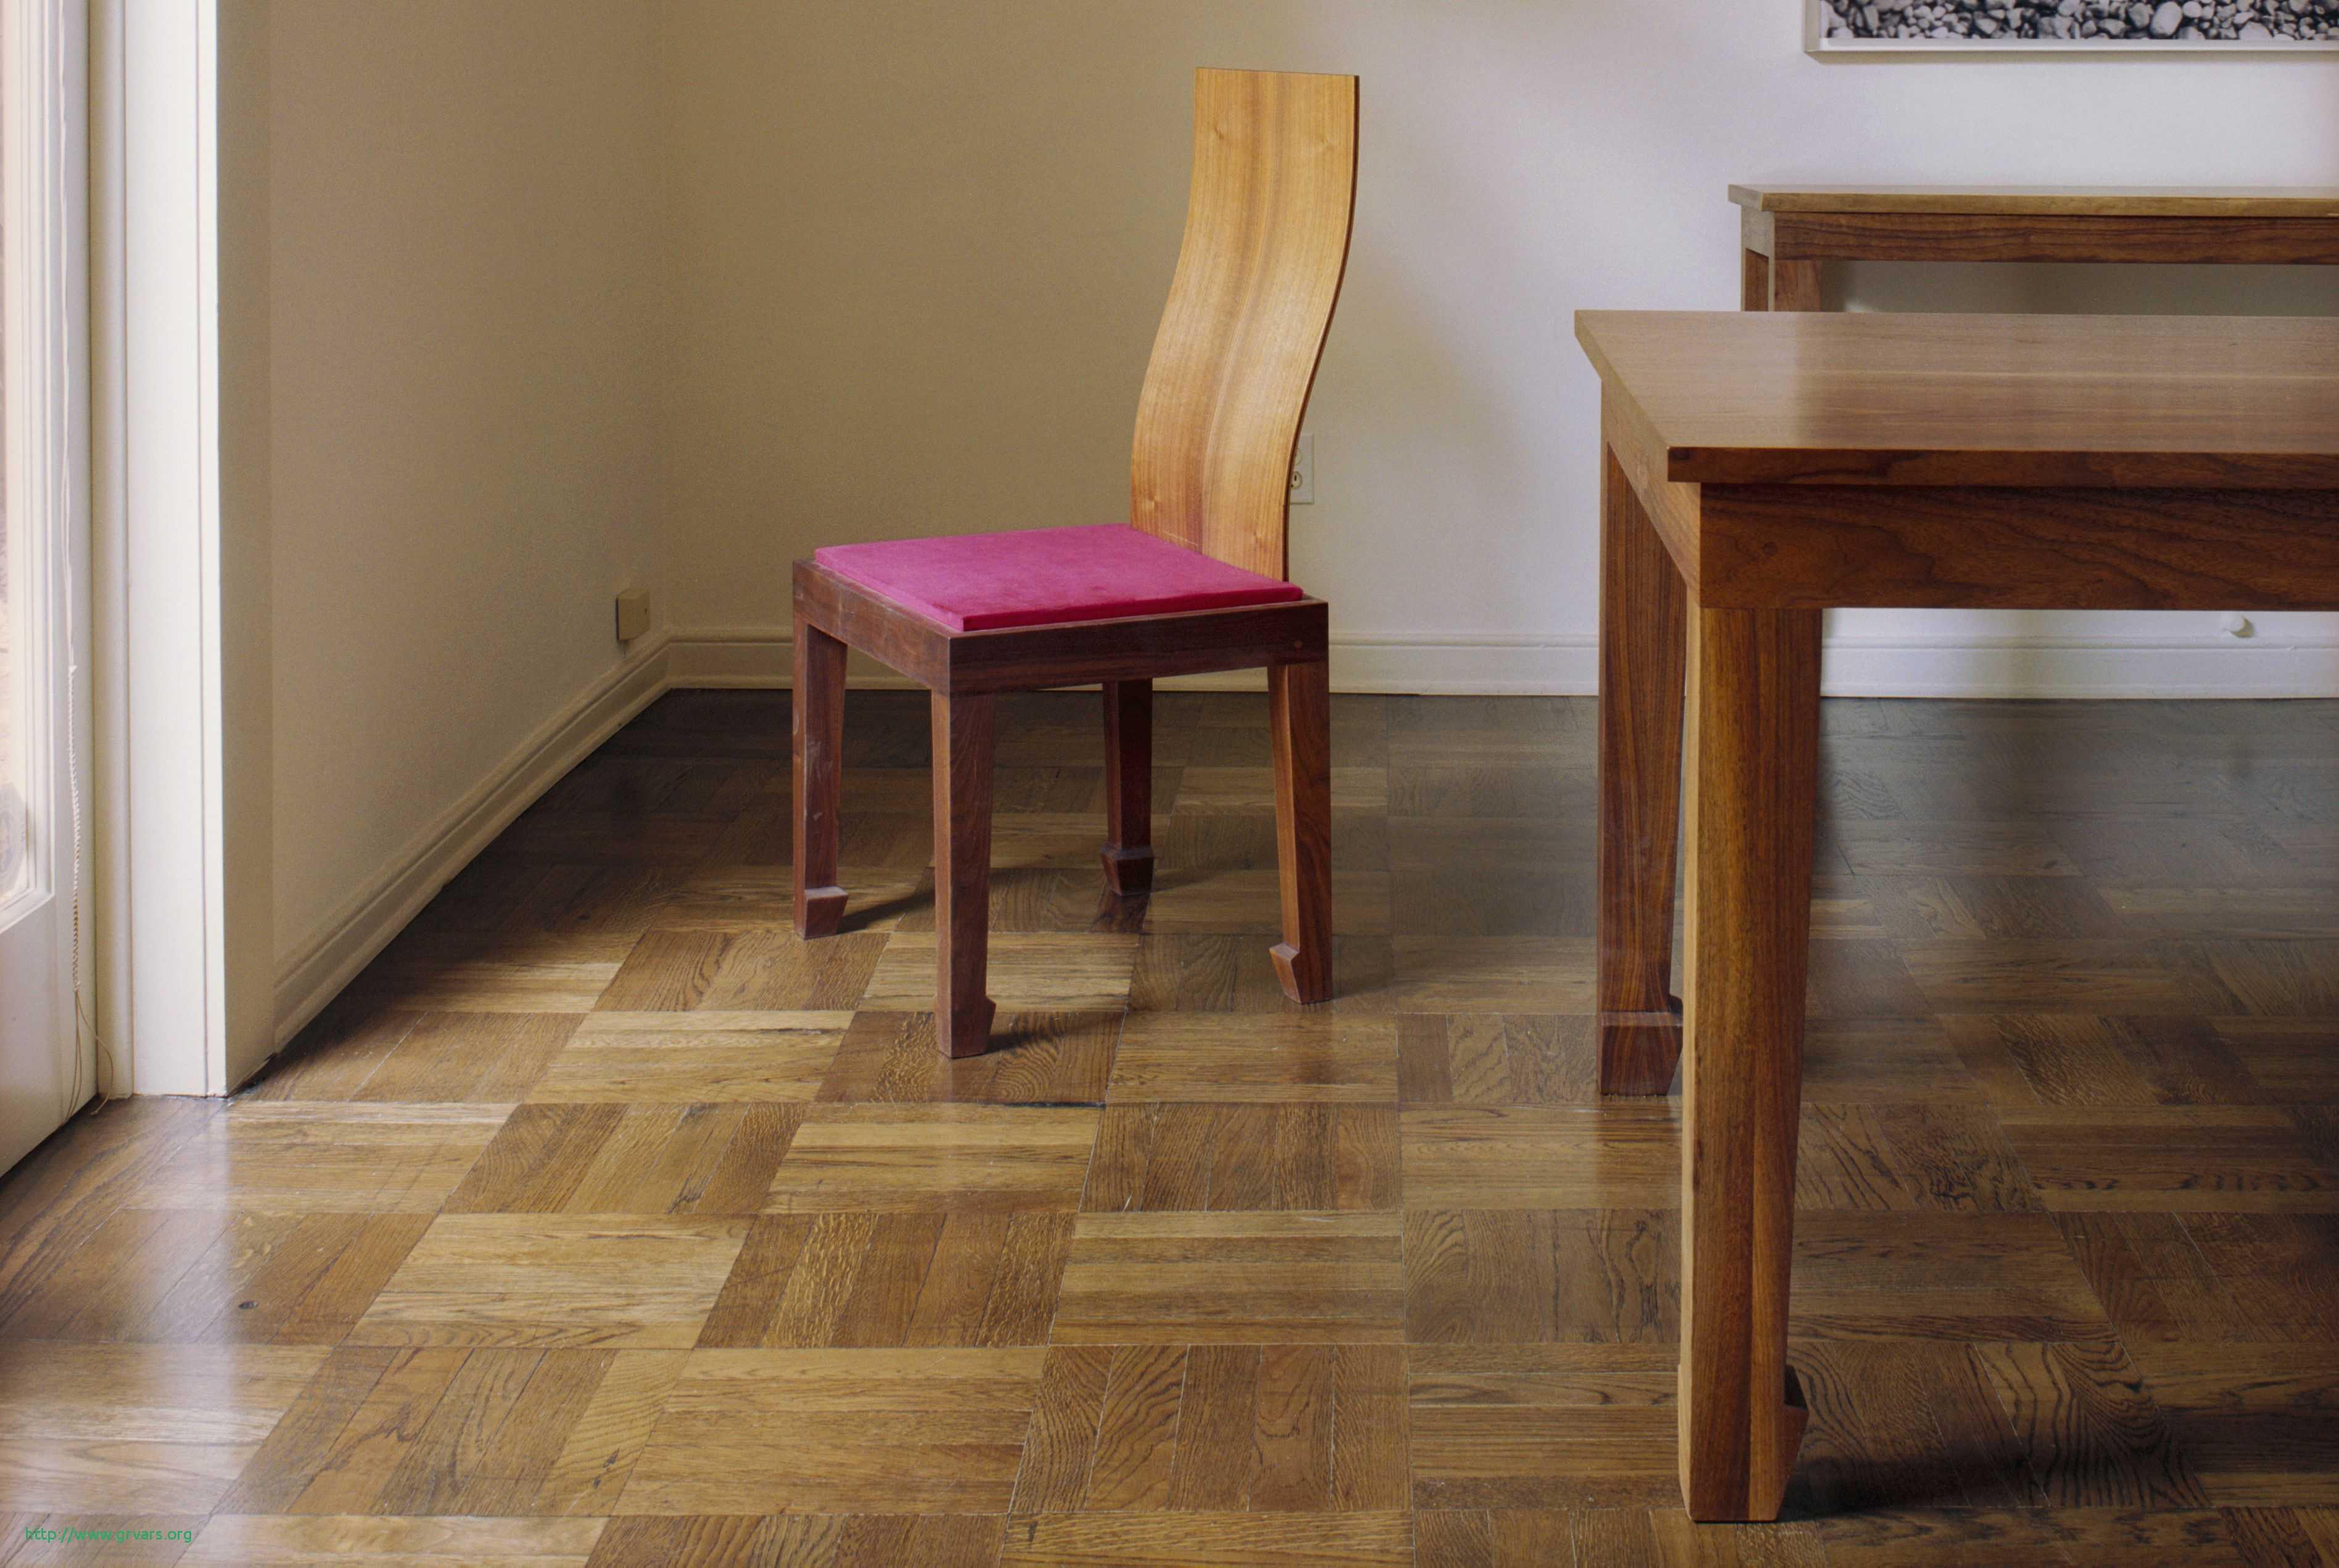 columbia hardwood flooring distributors of 24 impressionnant most affordable hardwood floors ideas blog with most affordable hardwood floors unique wood parquet flooring poised for a resurgence